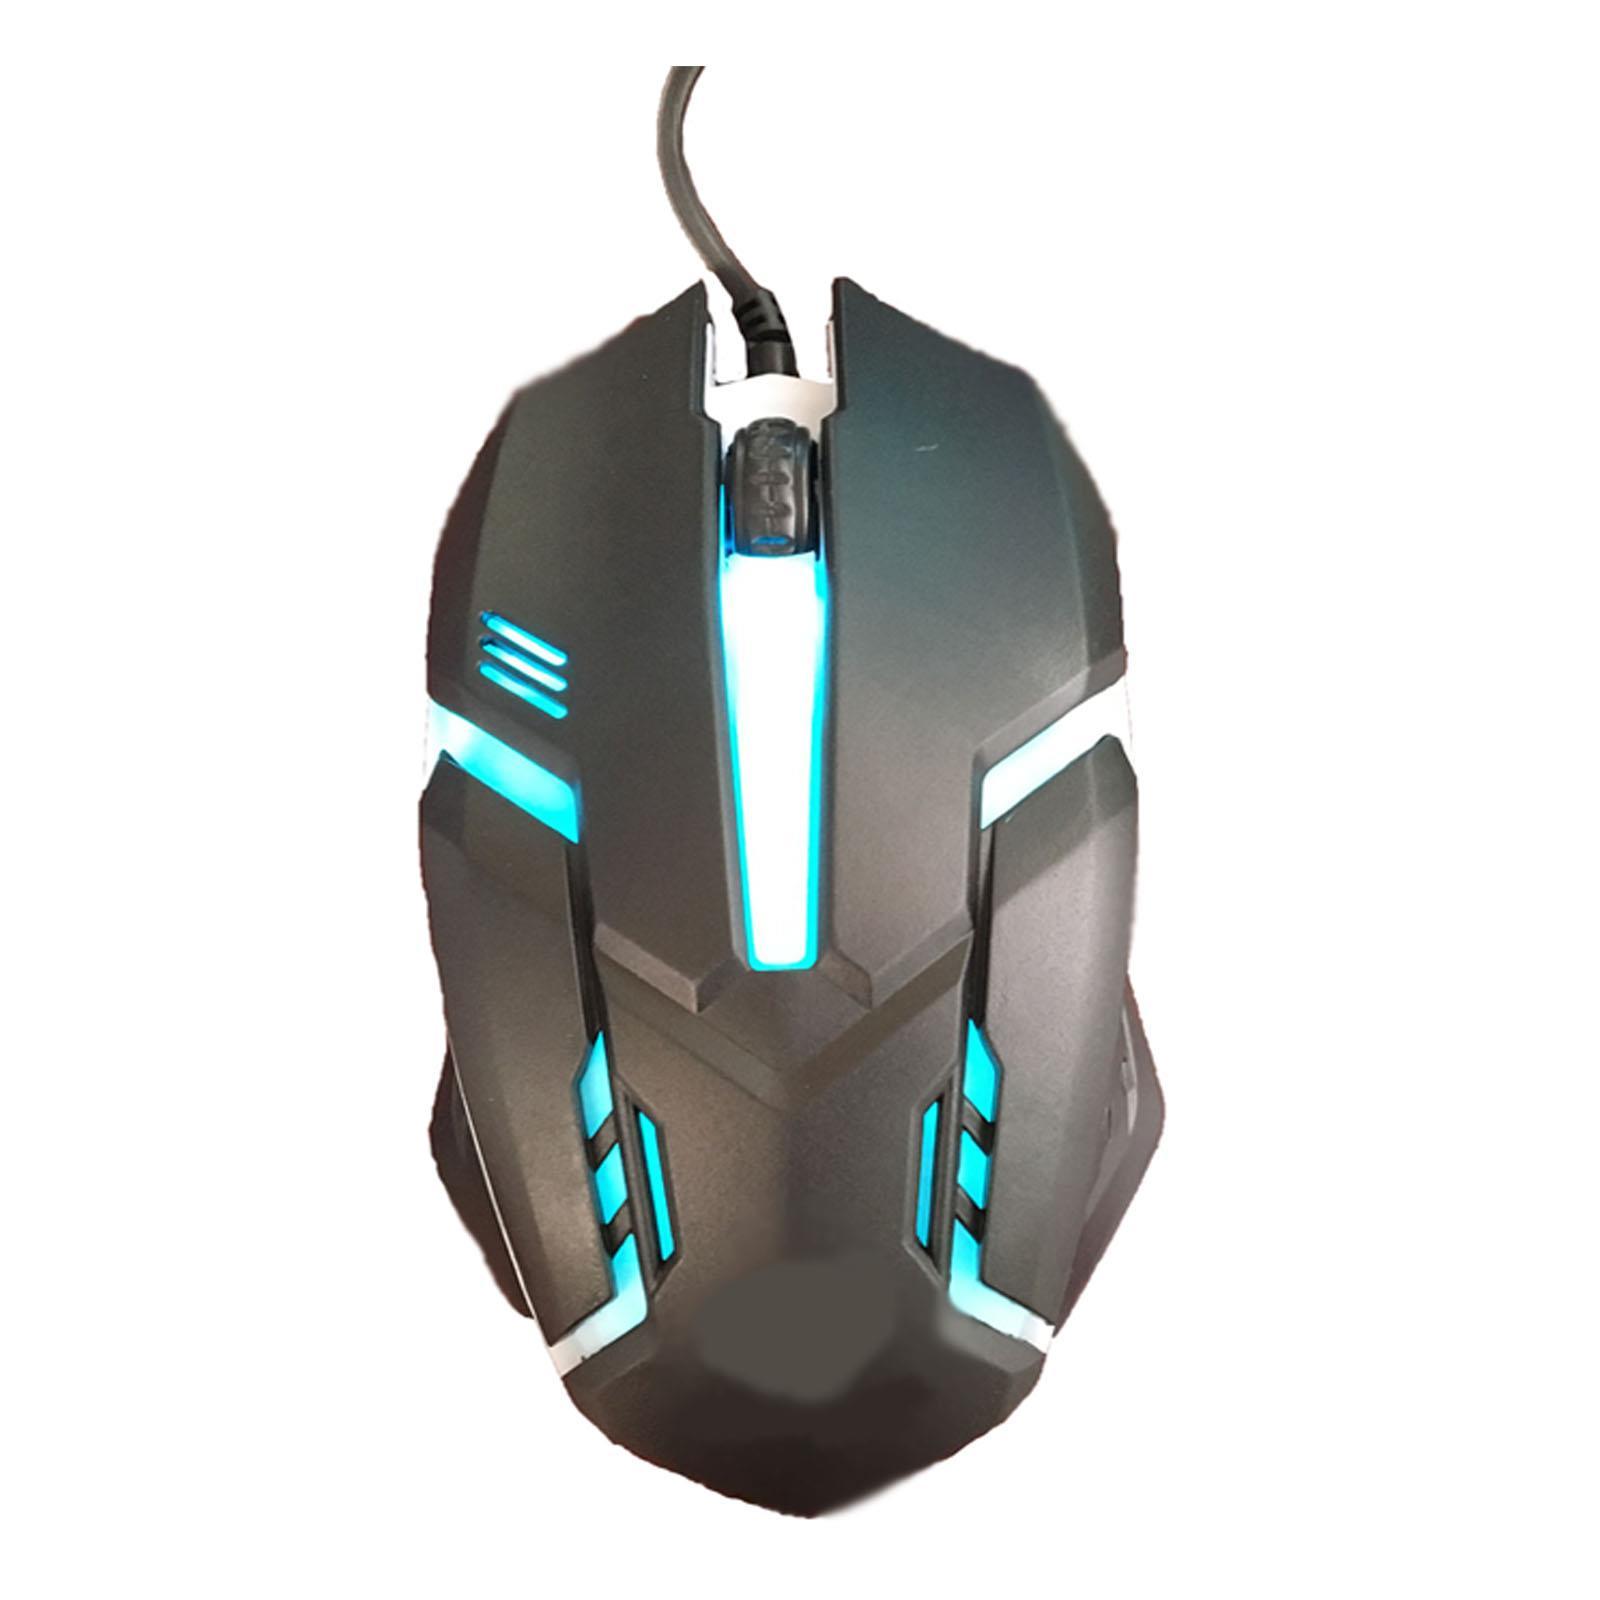 Gaming-Keyboard-Mouse-Backlit-Rainbow-LED-USB-Set-for-PC-Laptop-PS4-Xbox-One thumbnail 22